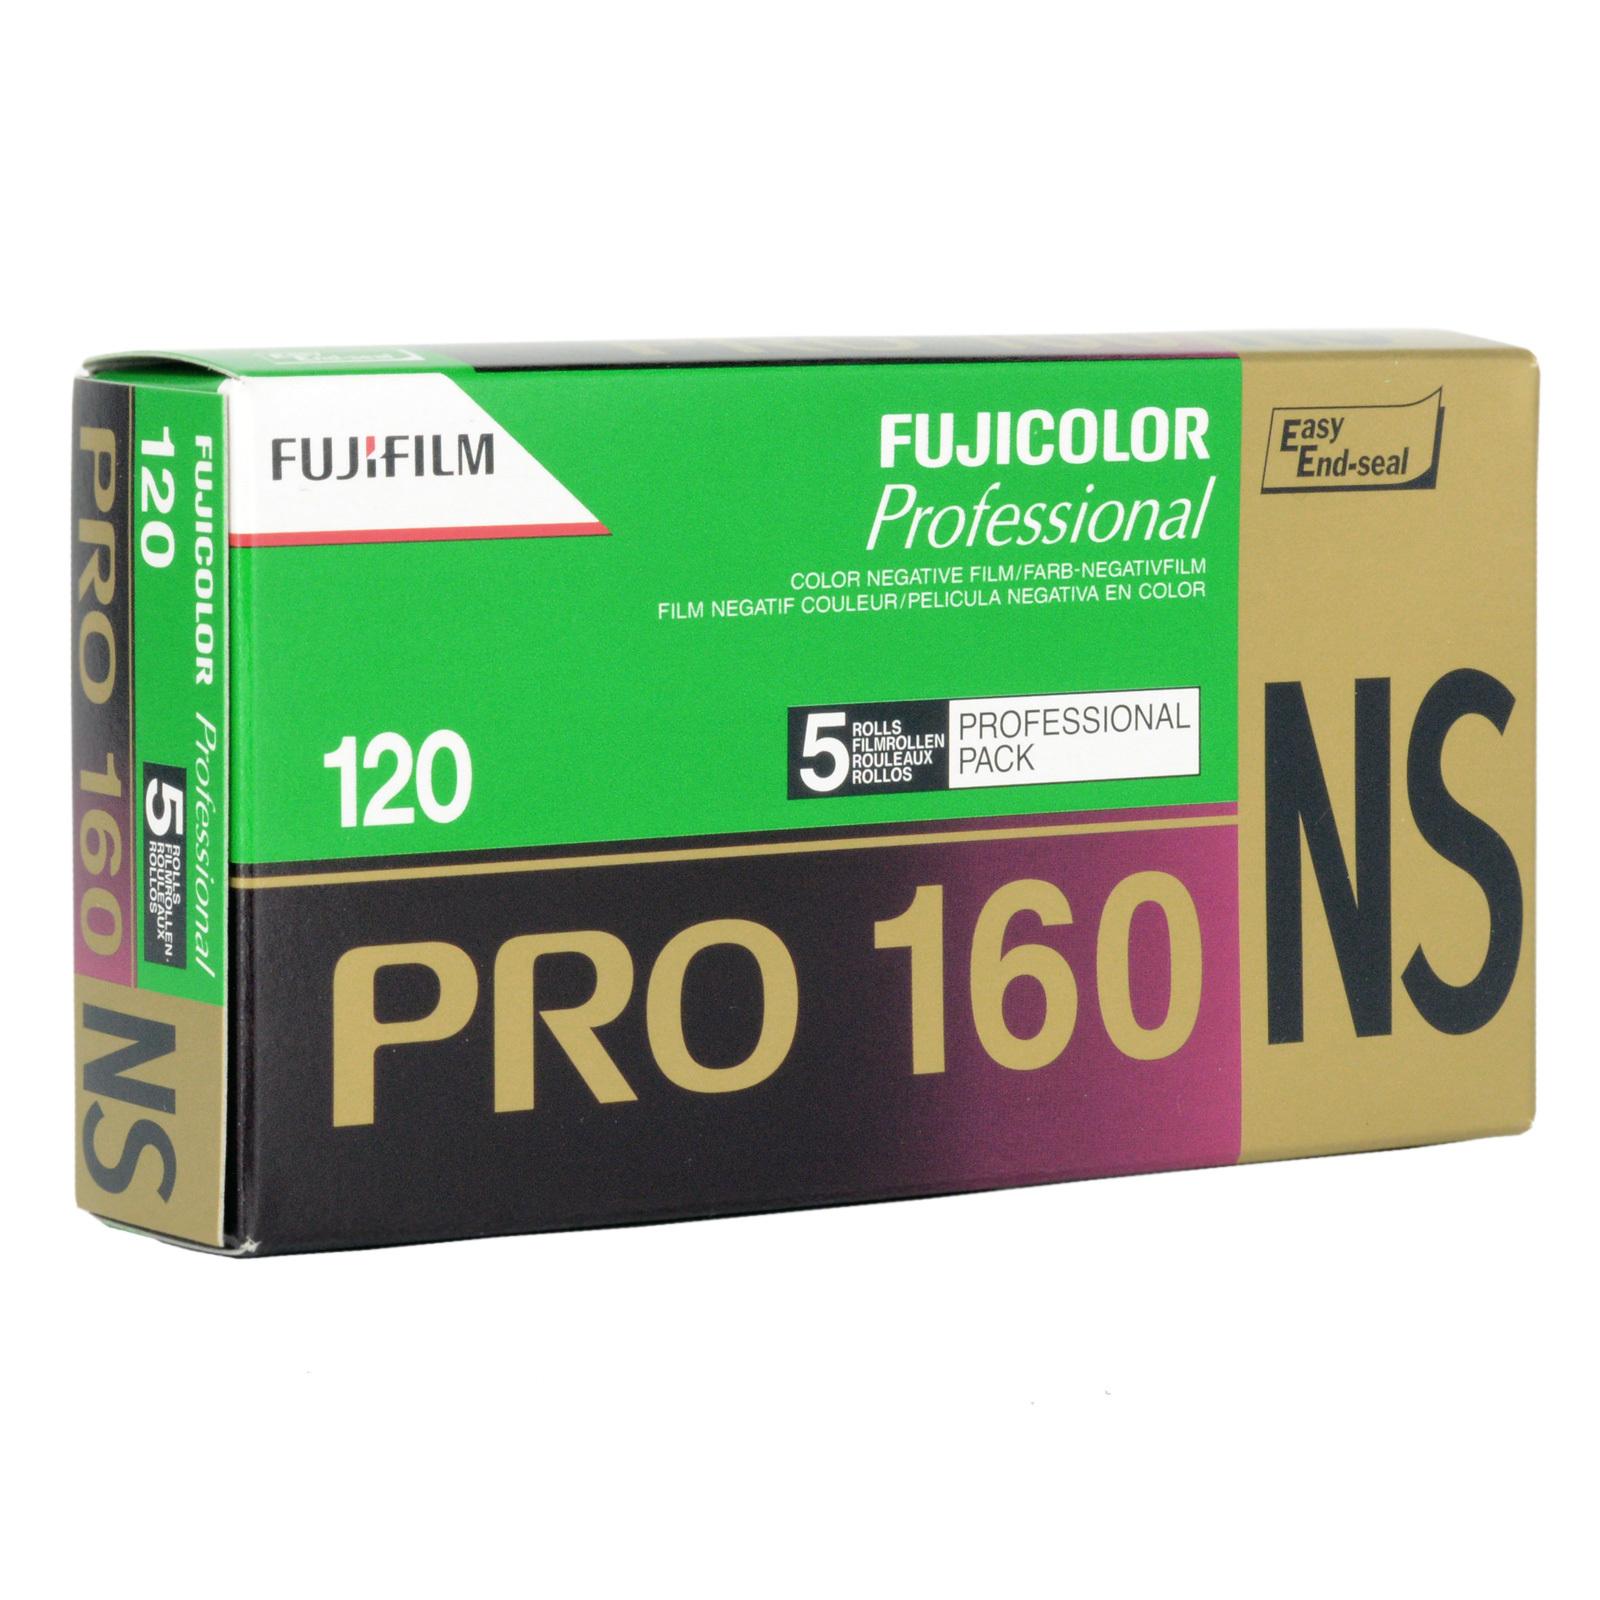 Фотопленка FujiFilm PRO 160NS/120